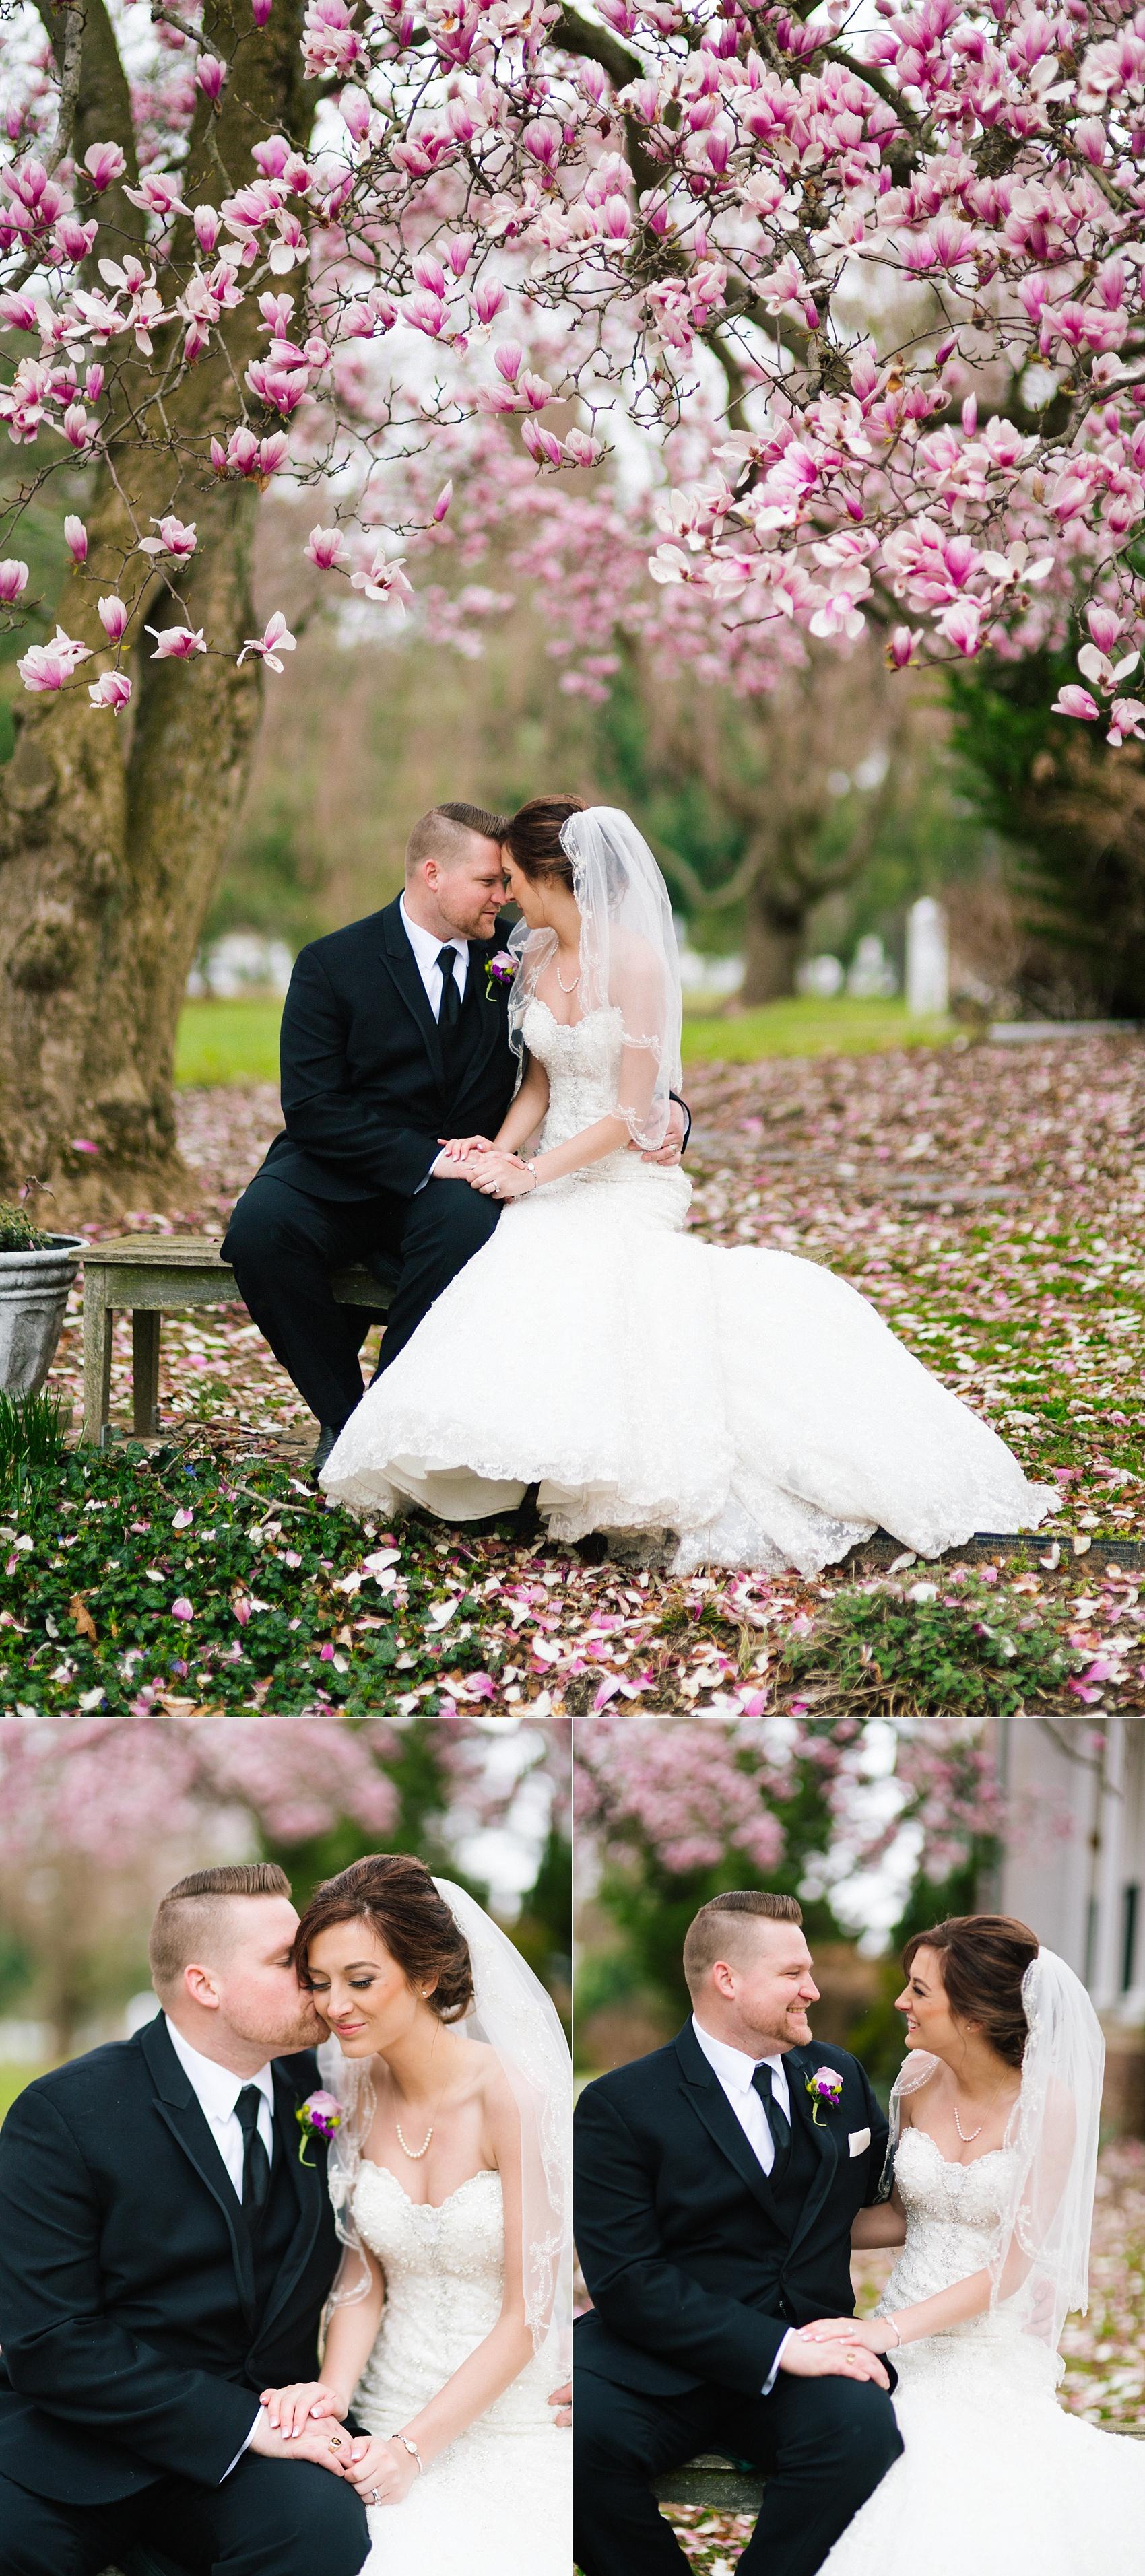 dwayne lydia delaware wedding philadelphia baltimore washingtion dc wedding photographer-25